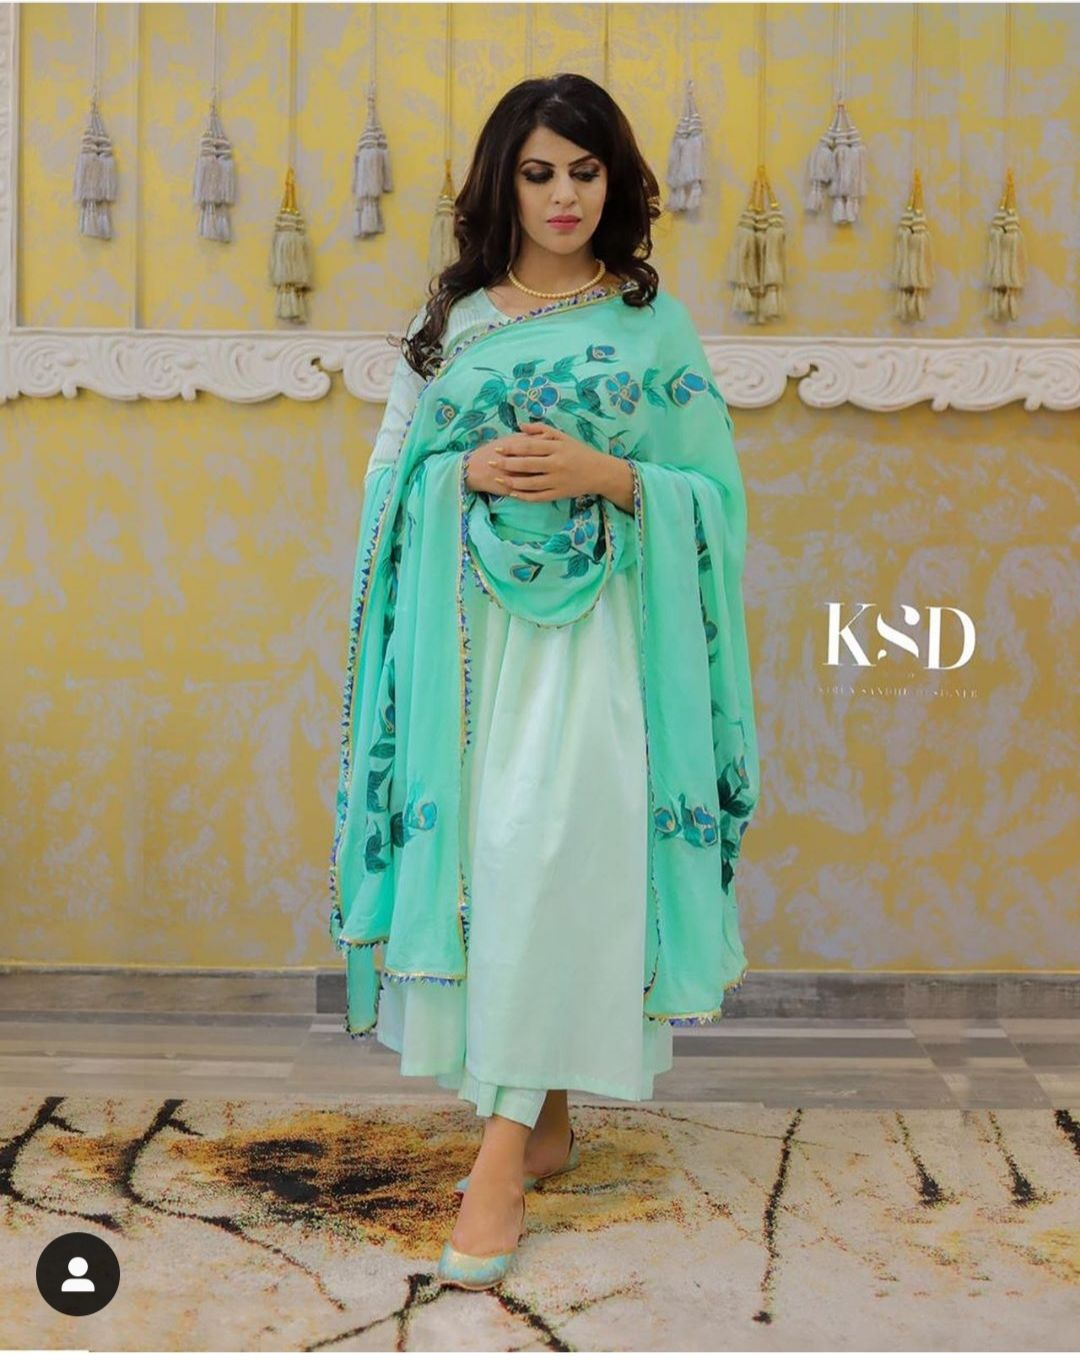 New Punjabi Suits Designs Summer 2020 Punjabi Culture Punjabi Girls Fashion In 2020 Different Dresses New Punjabi Suit Neck Designs For Suits